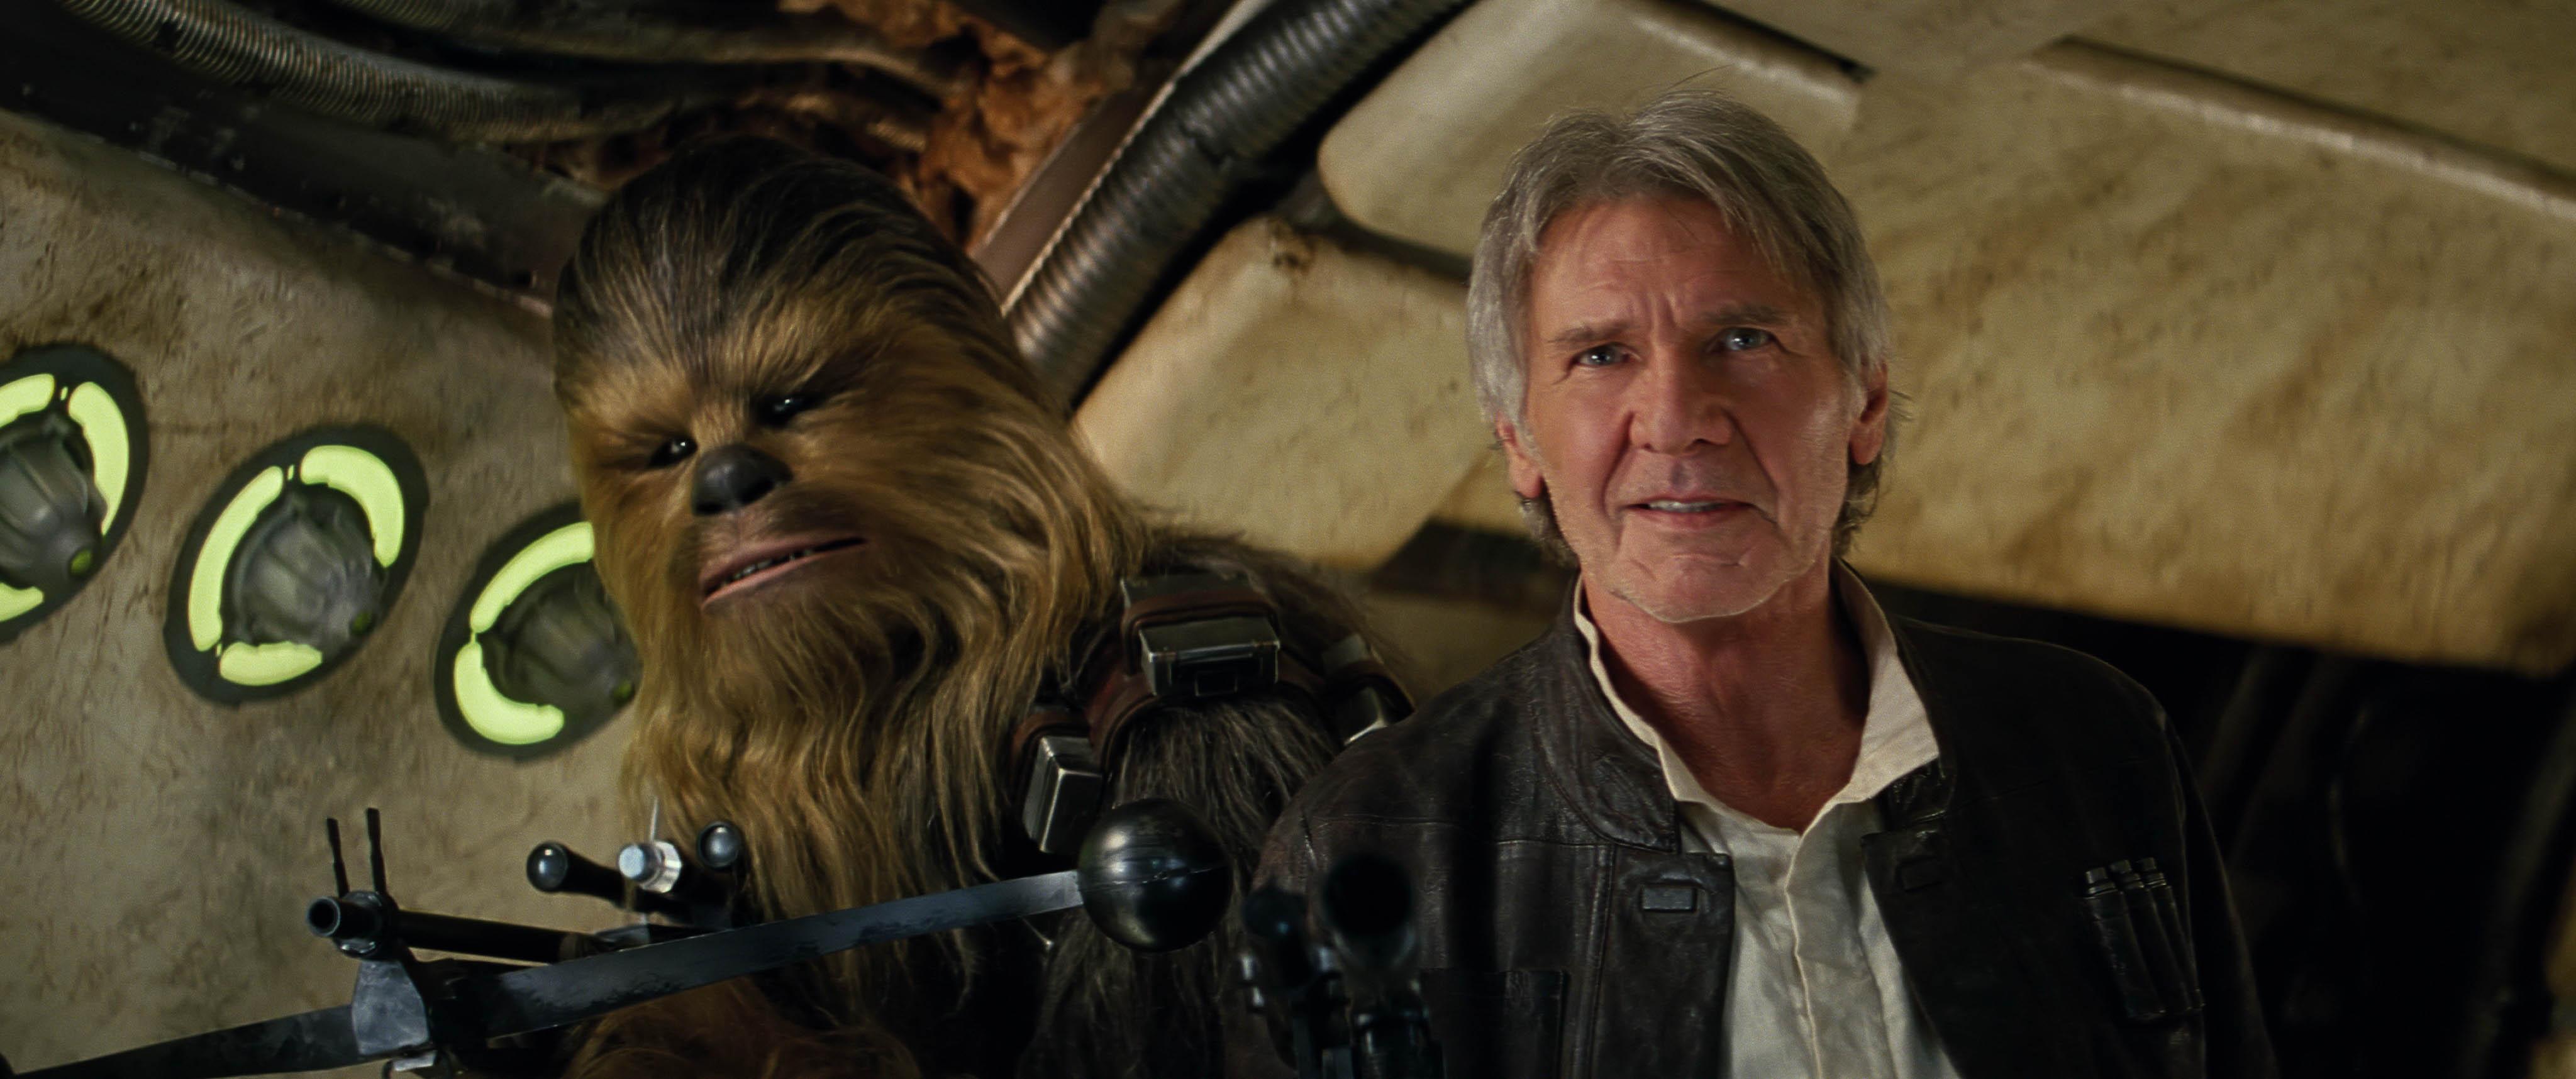 https://cinemaplanet.pt/wp-content/uploads/2015/12/Star-Wars.jpg